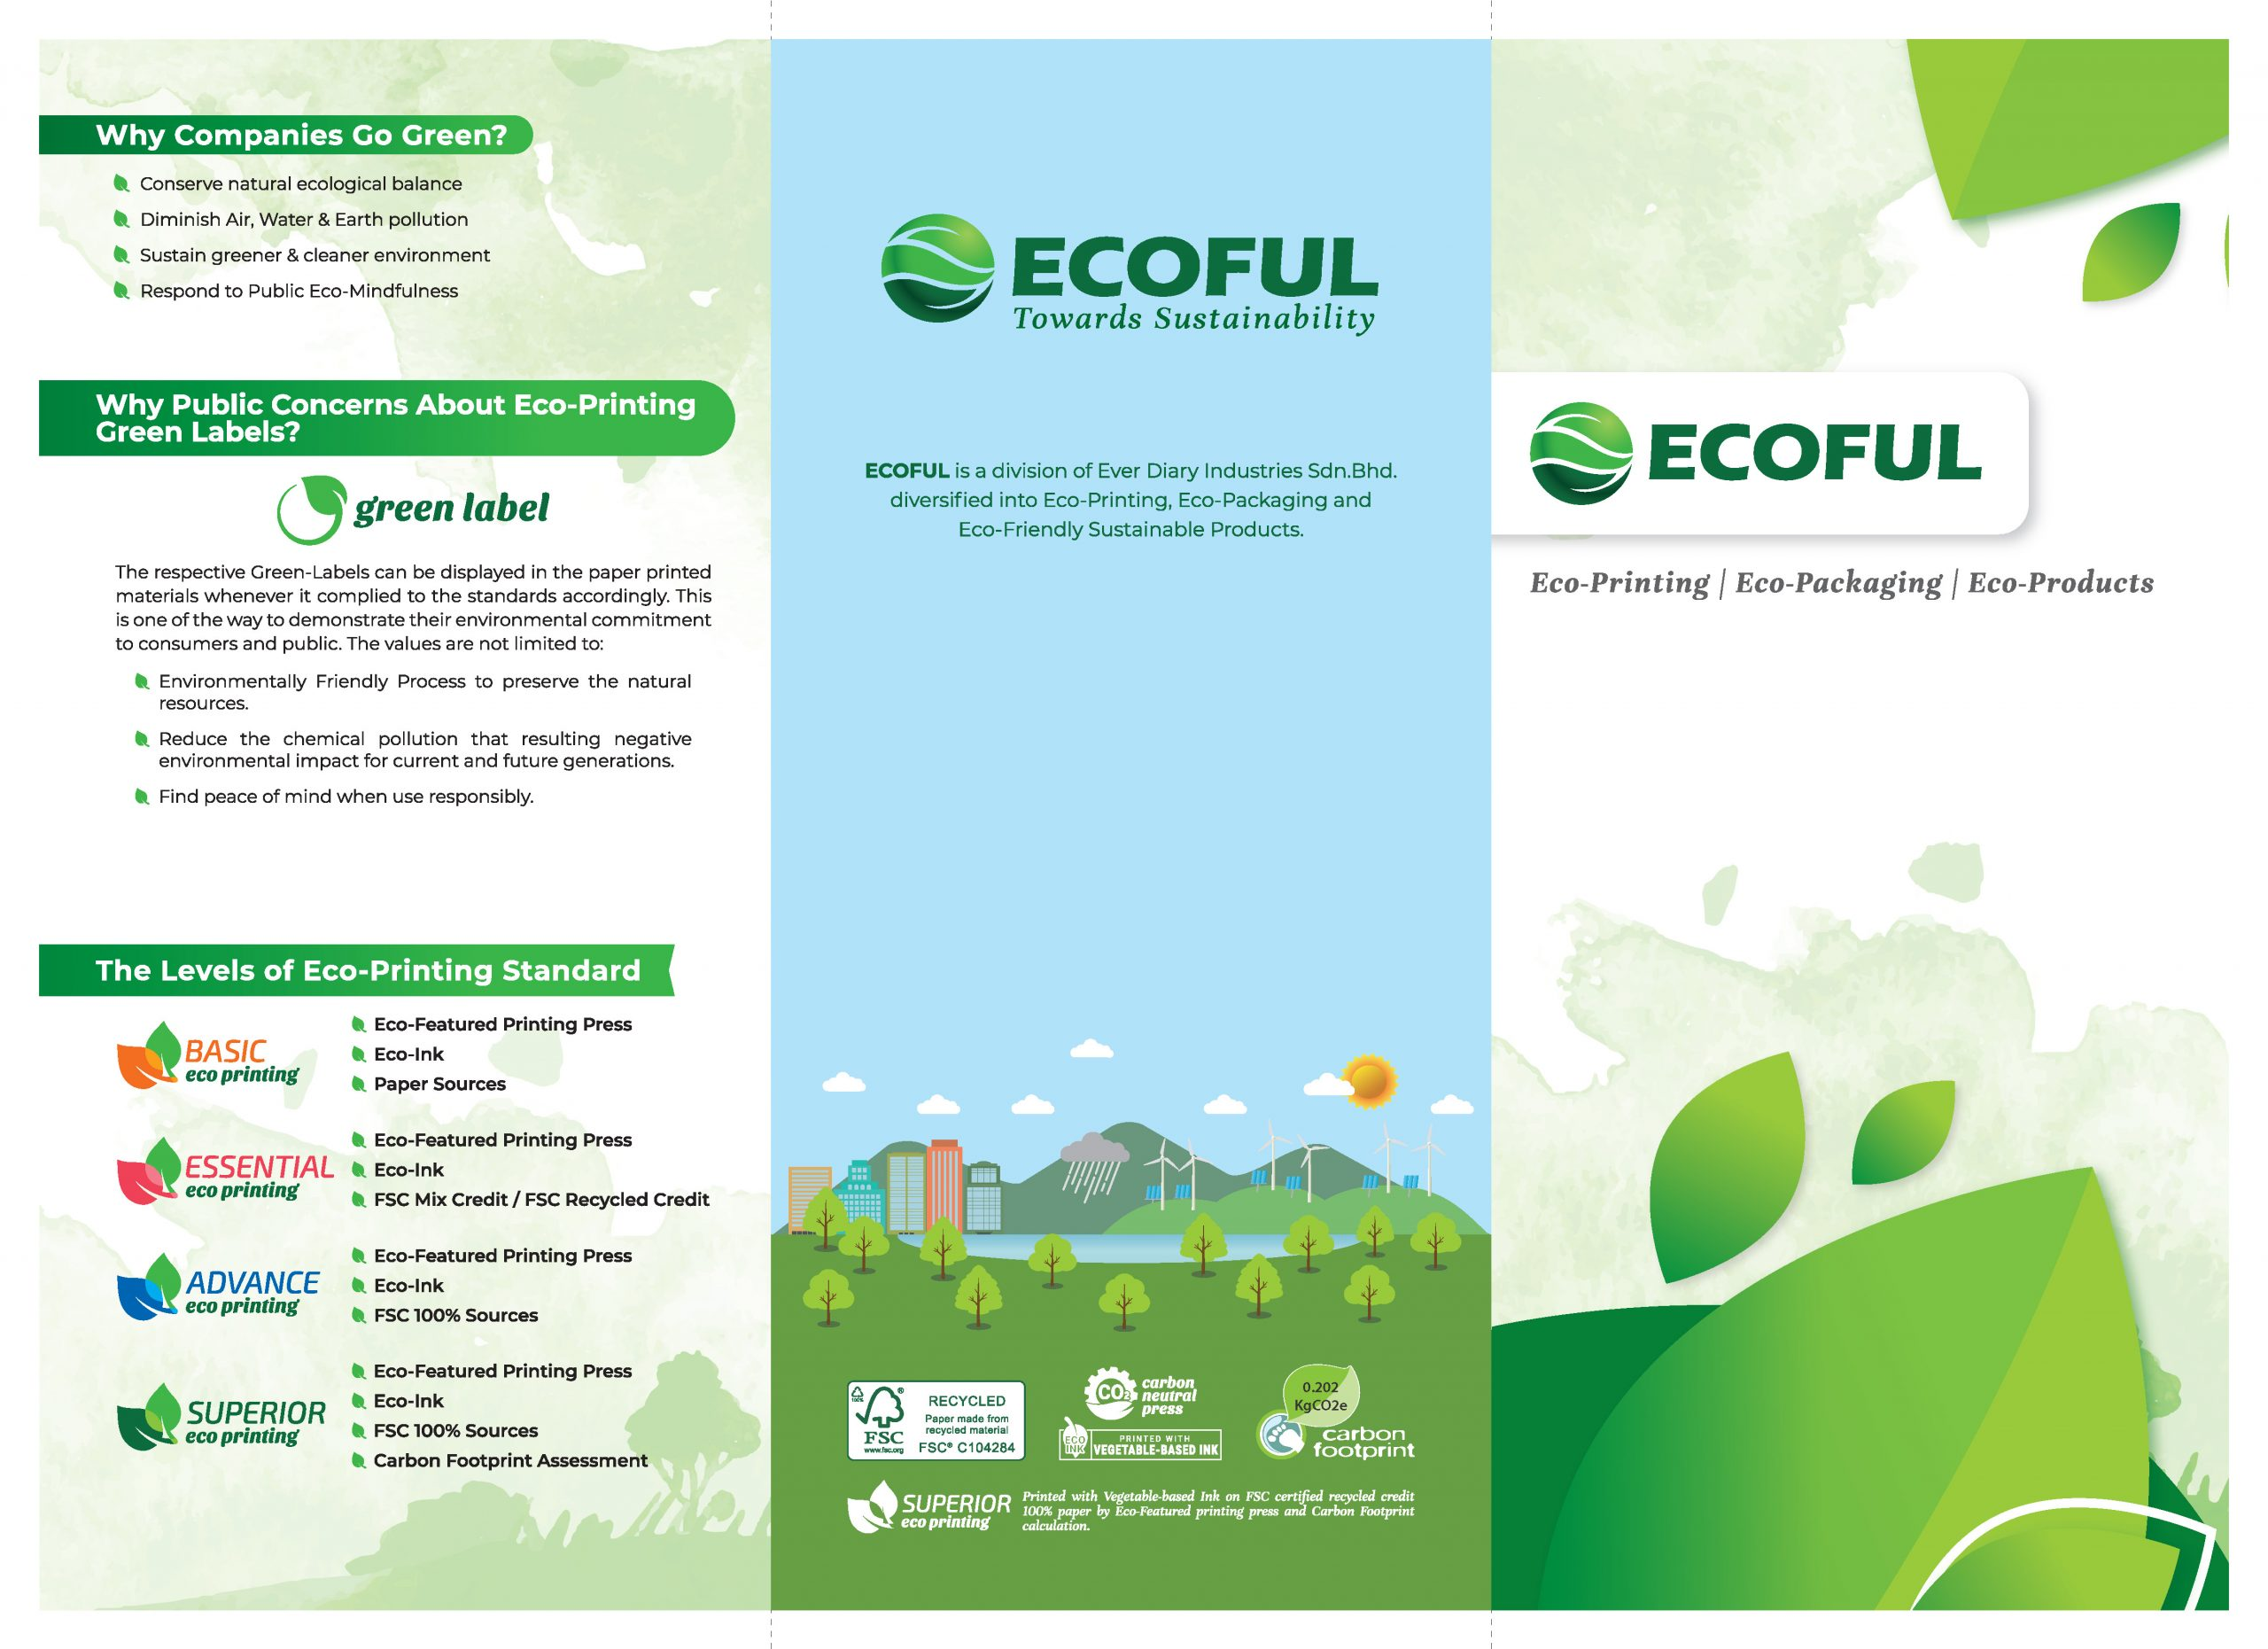 Ecoful_Brochure_NEW (1)_Page_1